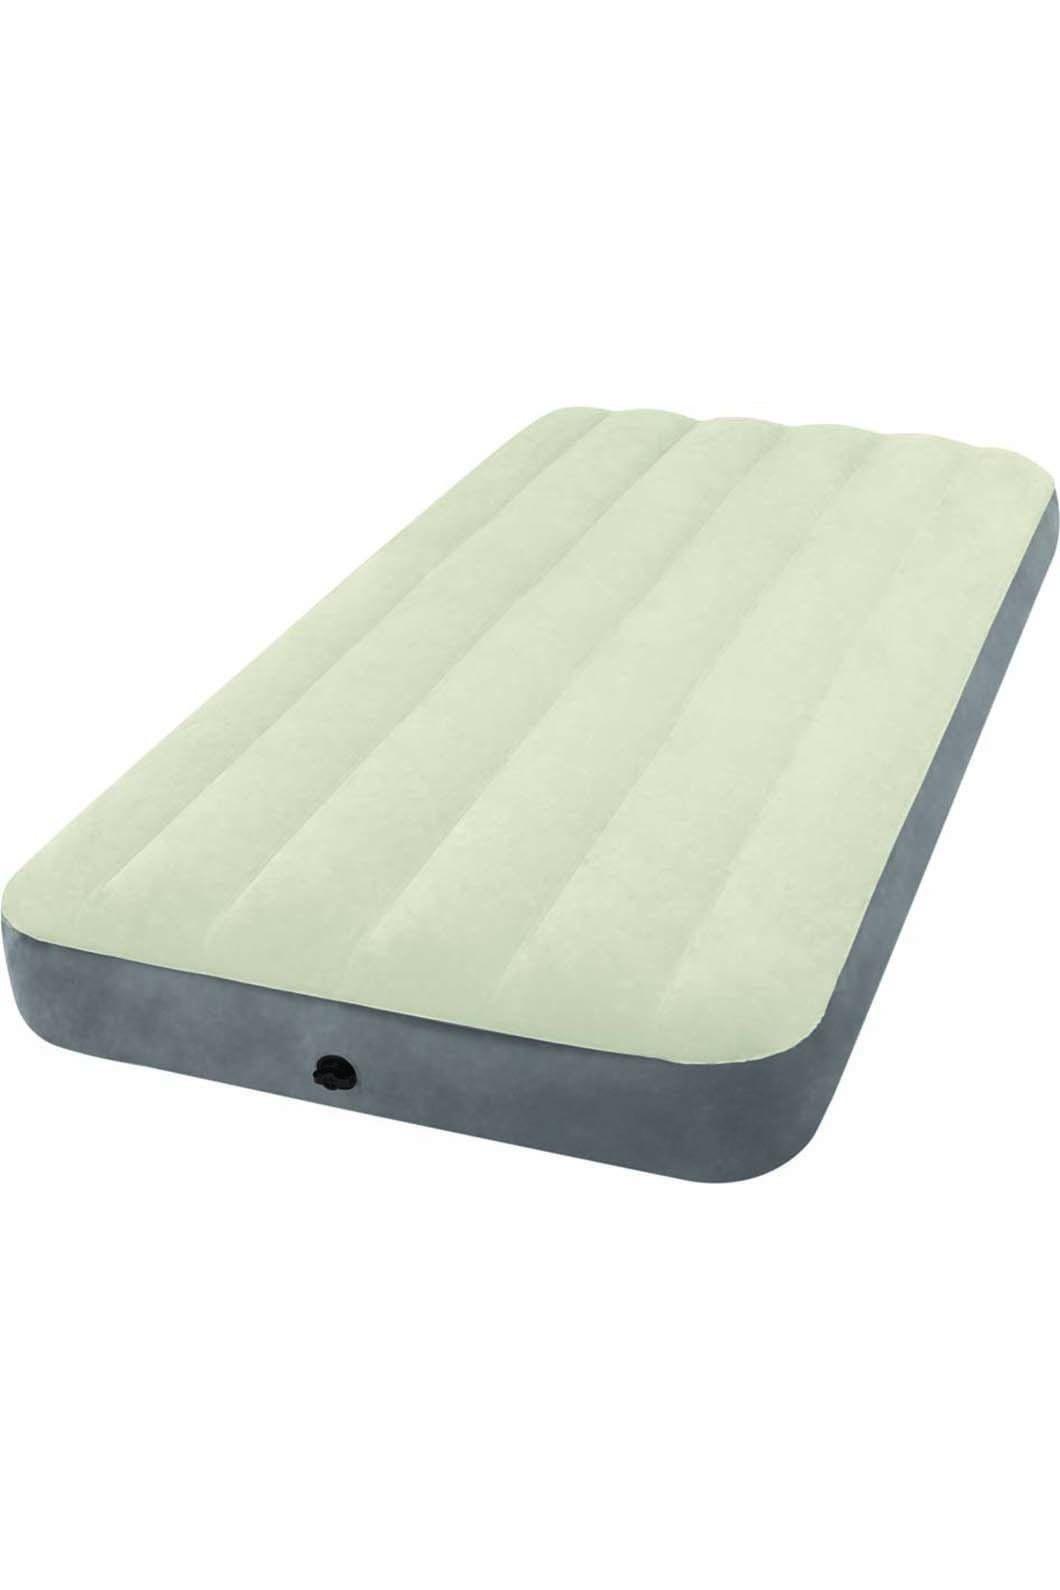 Intex Single Deluxe Dura-Beam Air Bed, None, hi-res